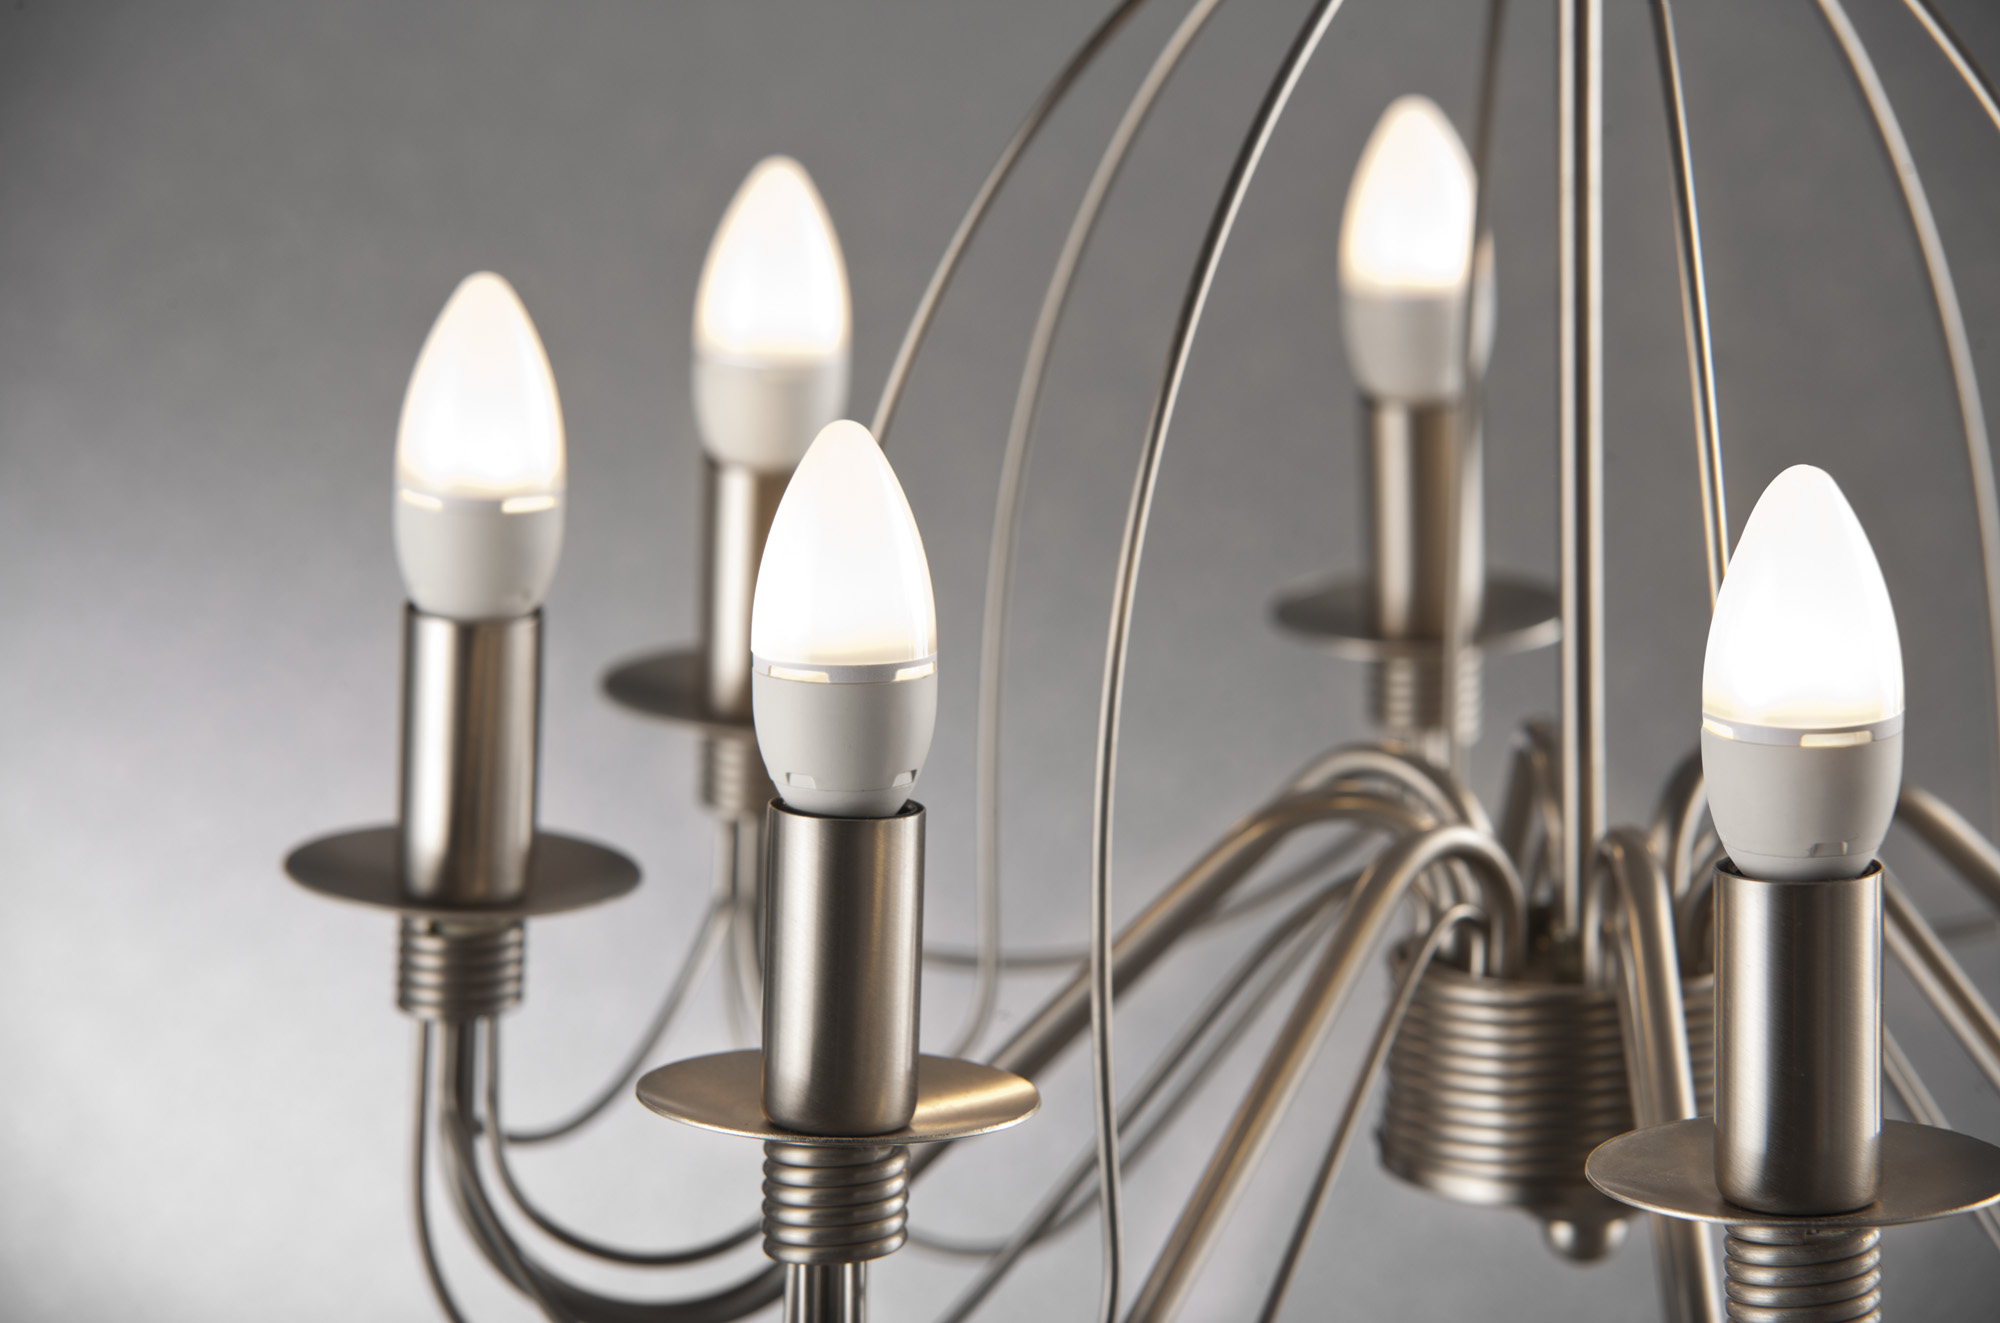 lampe flamme standard led e14 230v 4w blanc chaud 3000k paulmann. Black Bedroom Furniture Sets. Home Design Ideas